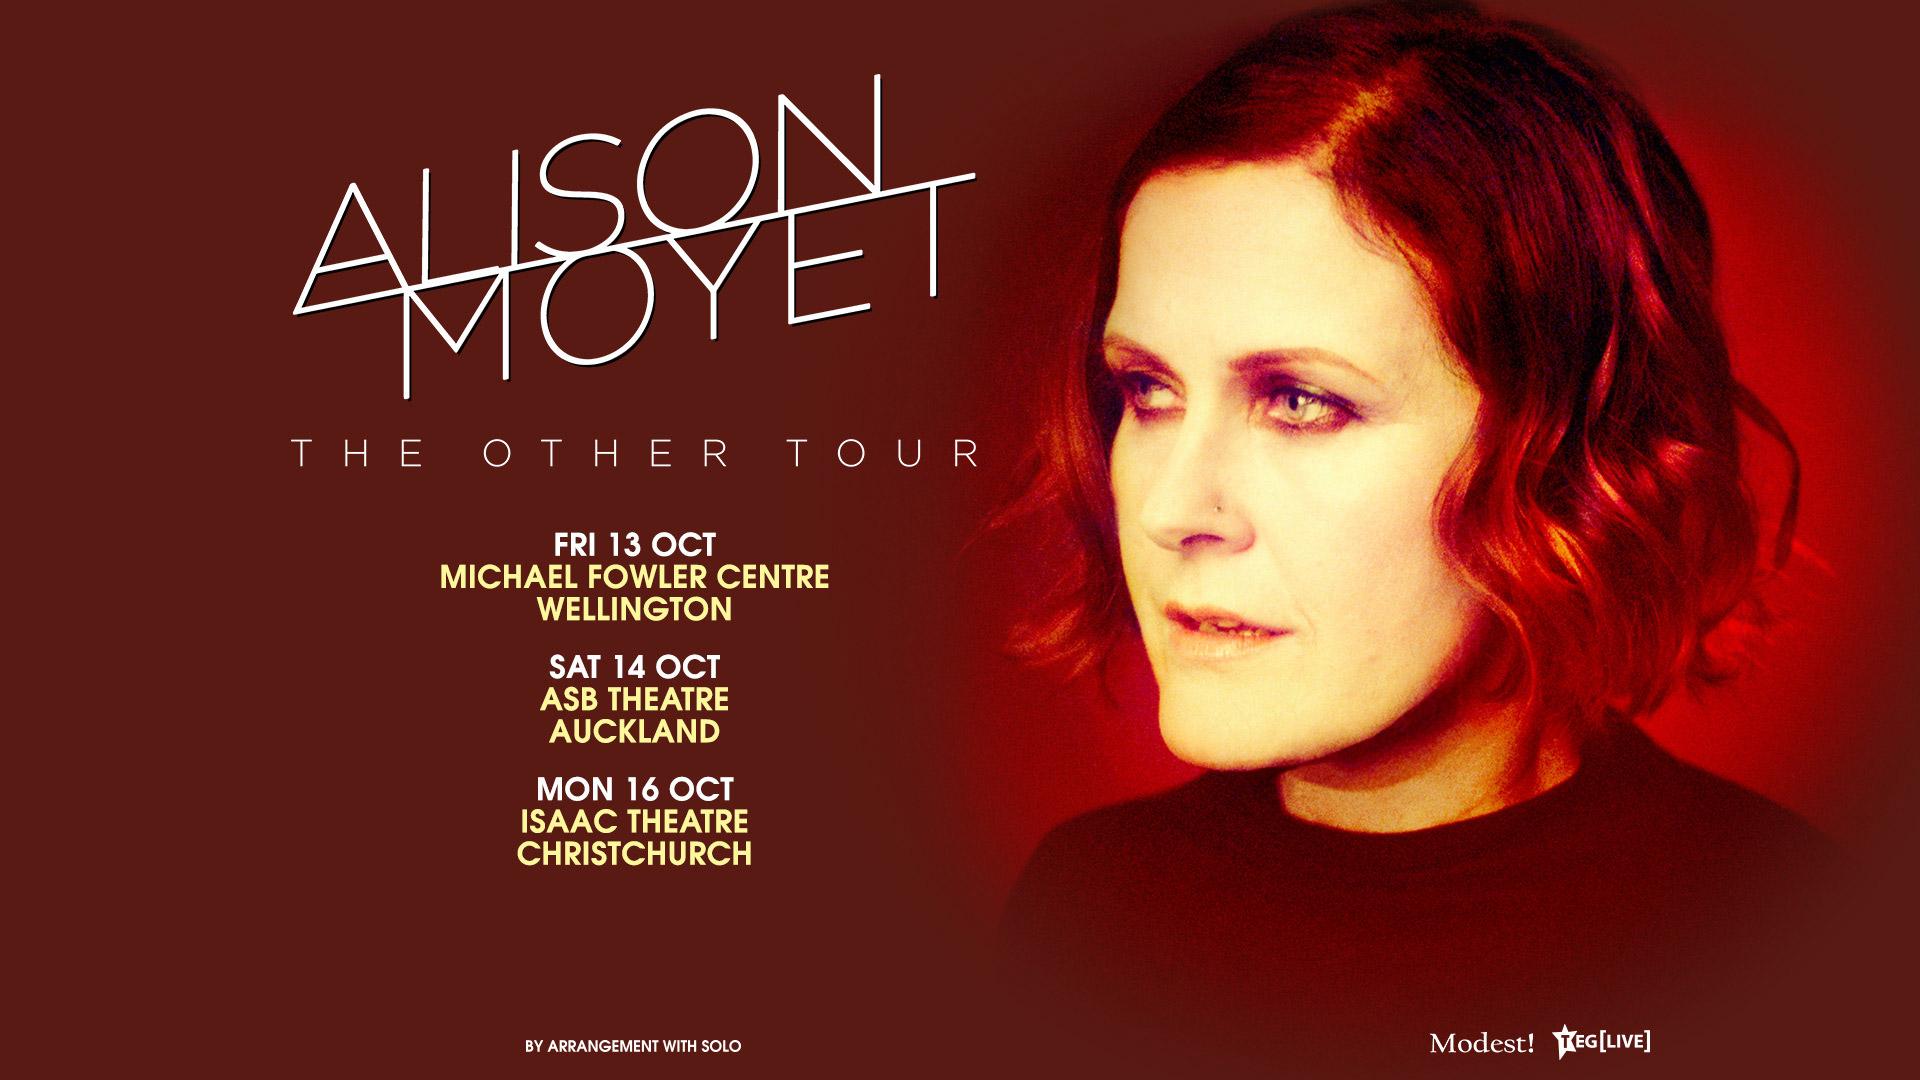 Alison Moyet NZ Tour Poster